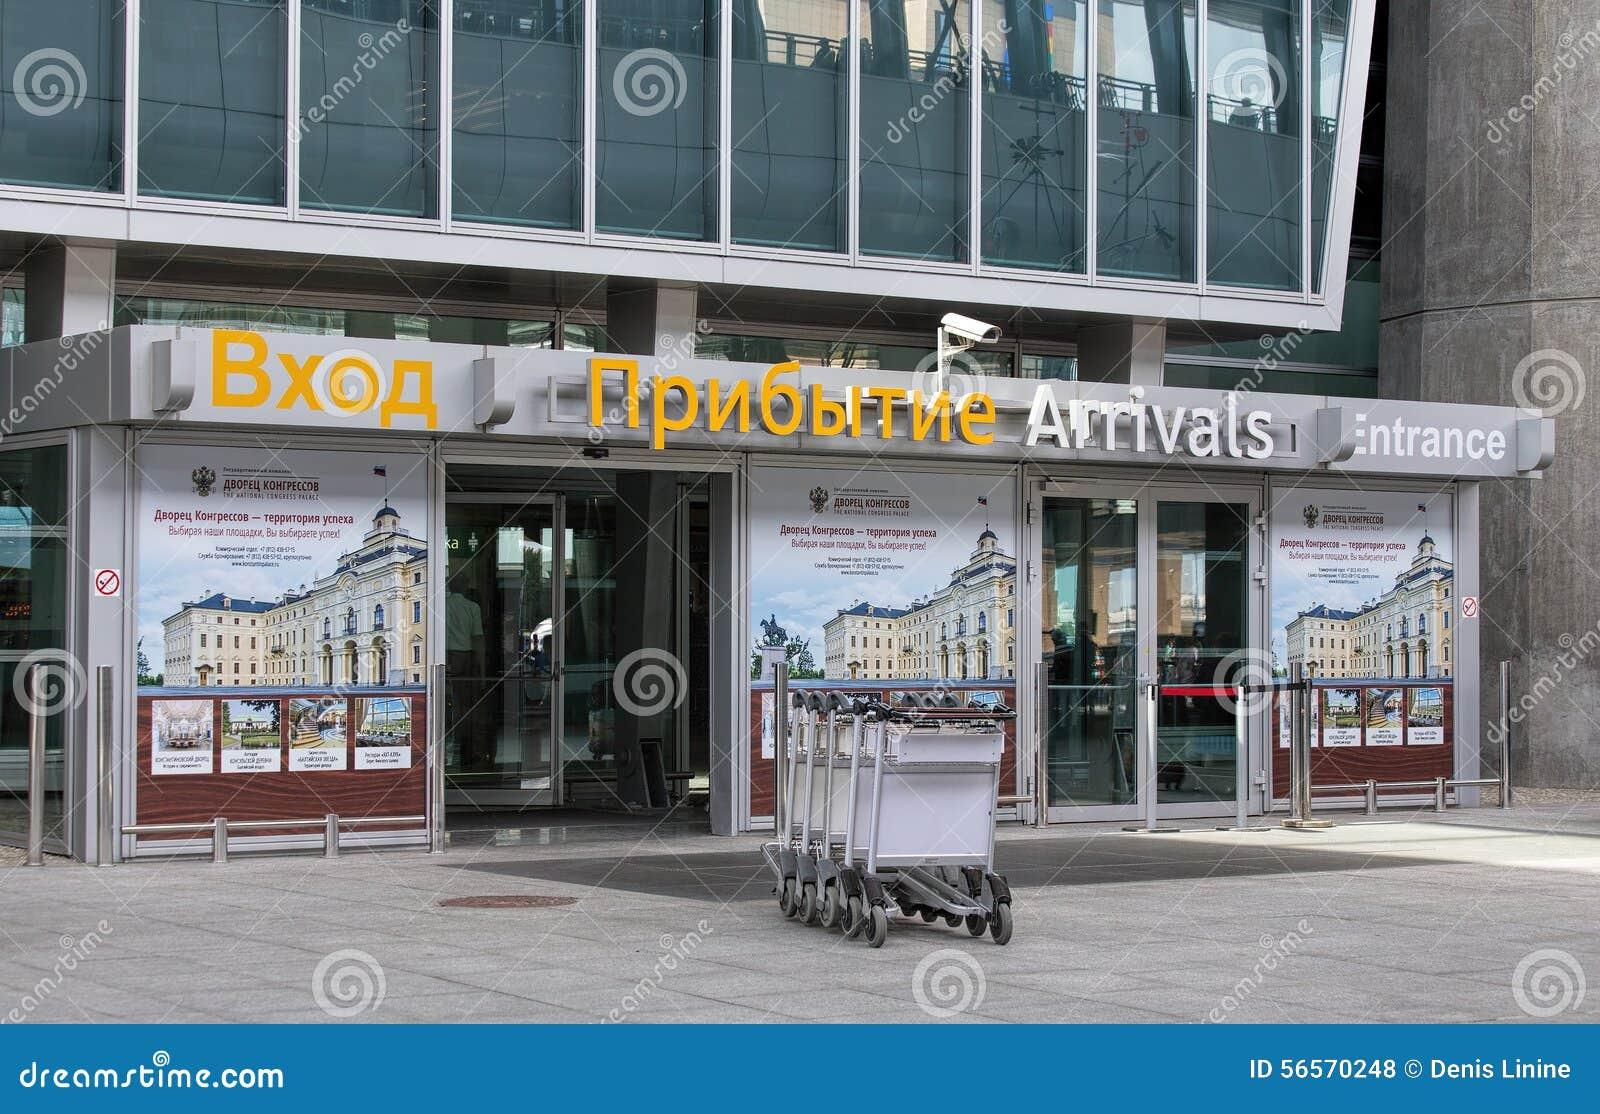 Download Είσοδος του αερολιμένα Pulkovo Εκδοτική Στοκ Εικόνες - εικόνα από άγιος, εξωτερικό: 56570248